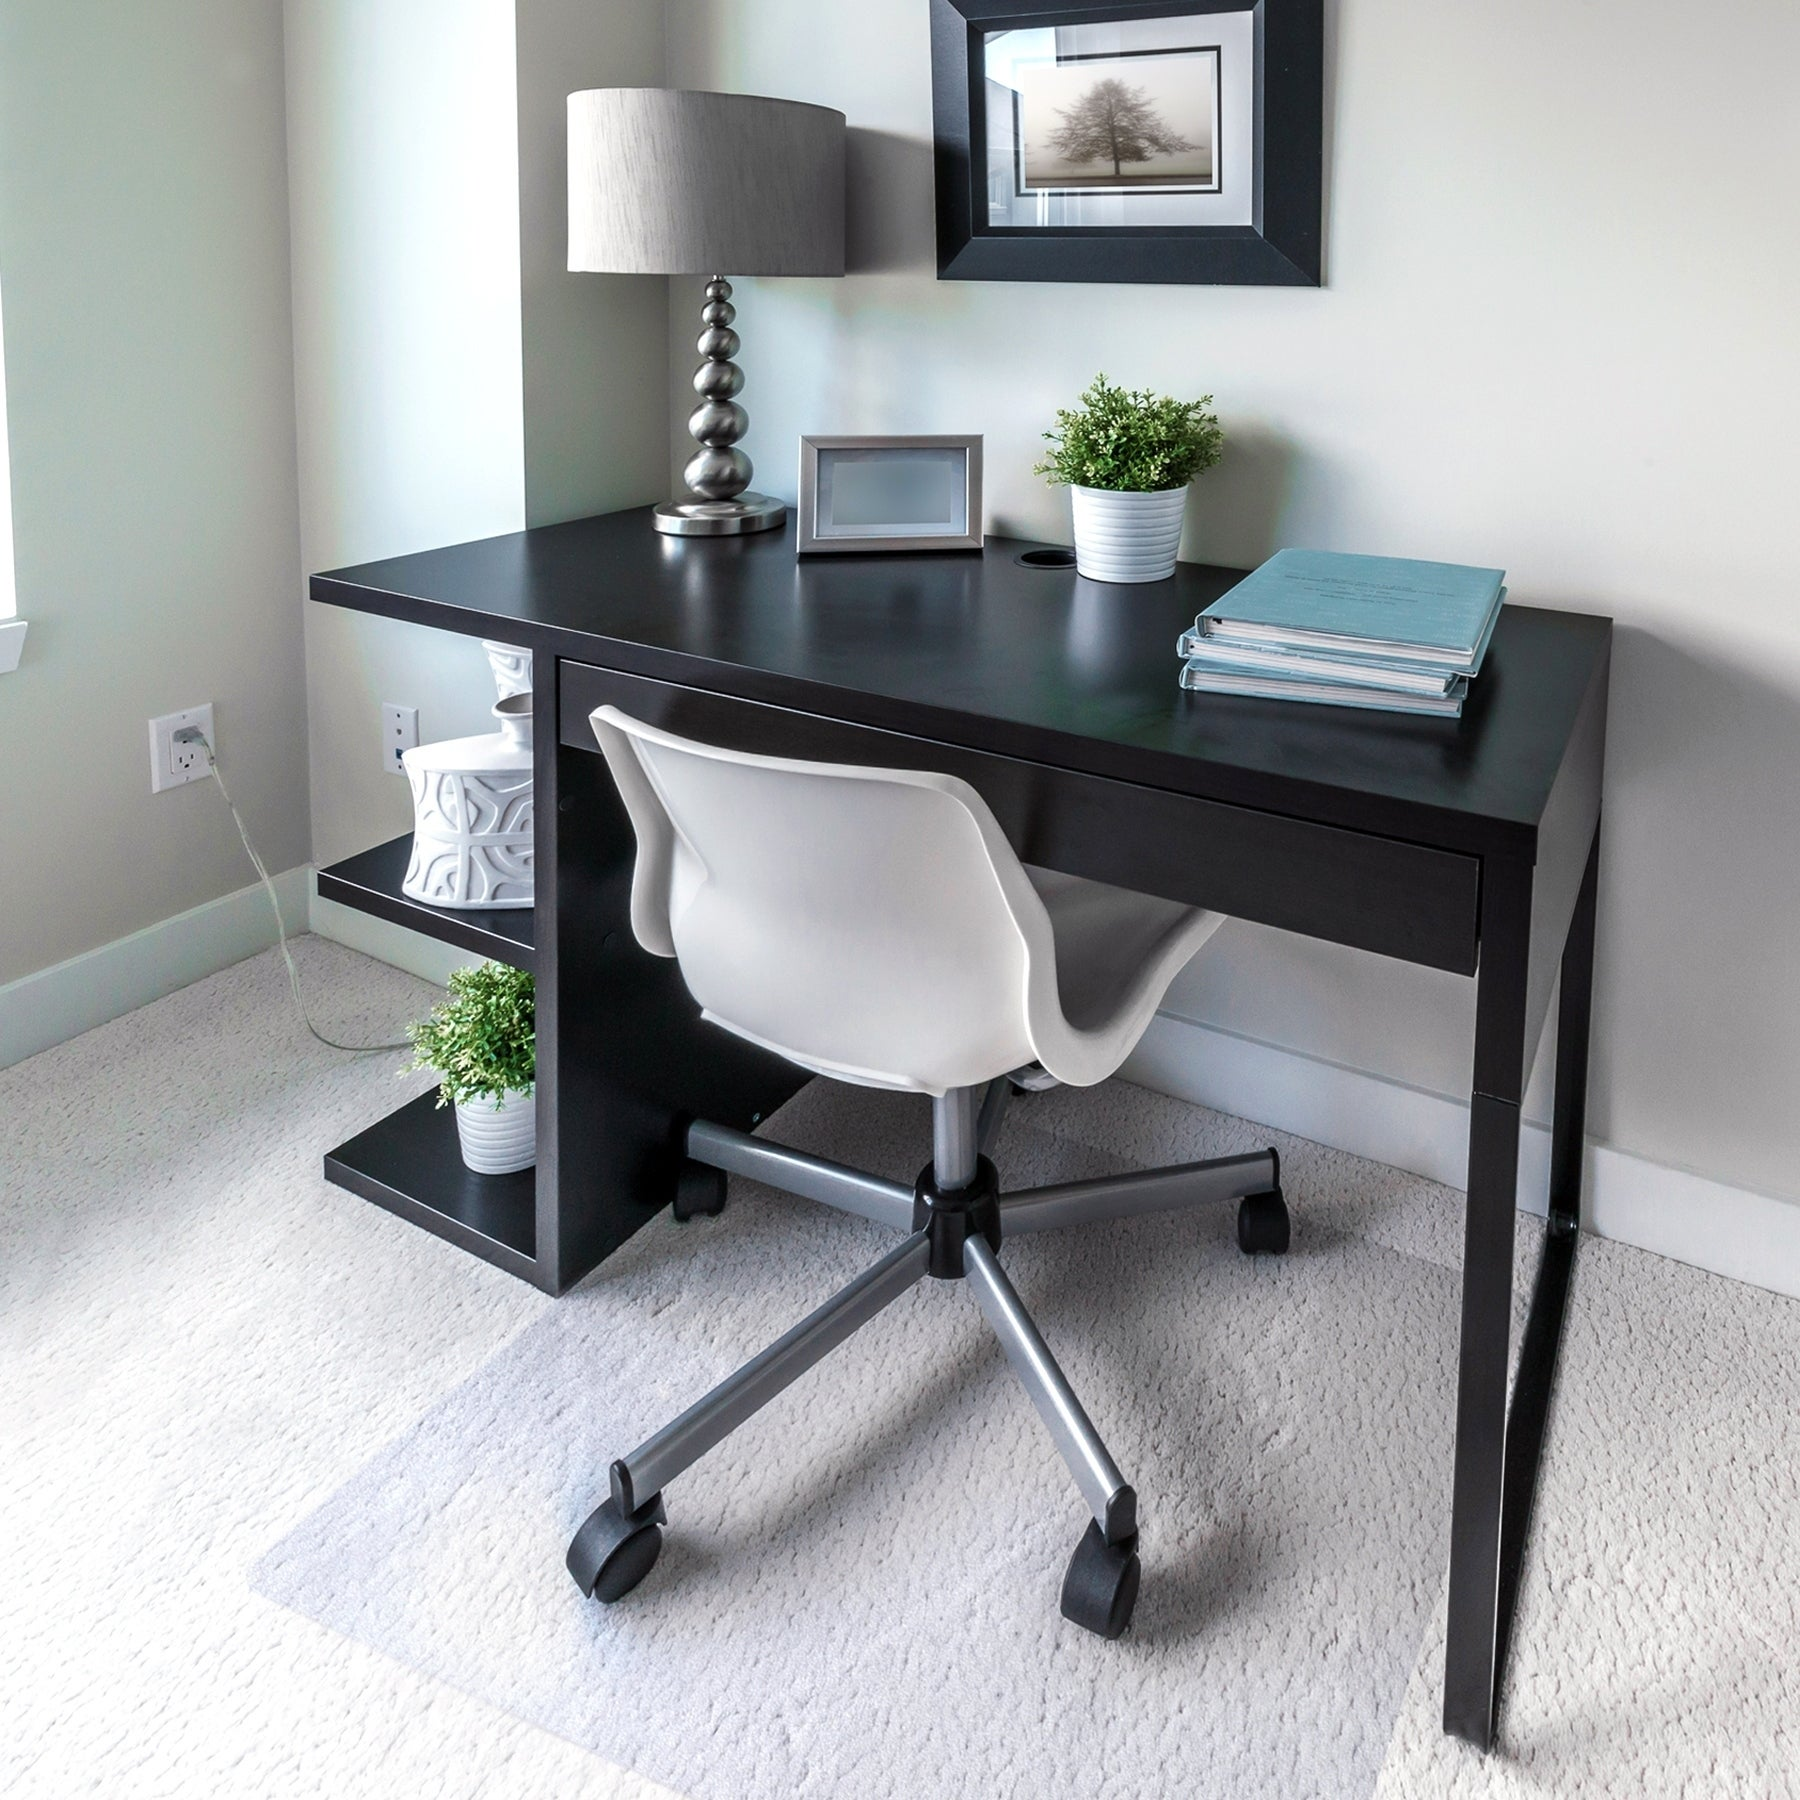 Polycarbonate Rectangular Chair Mat For